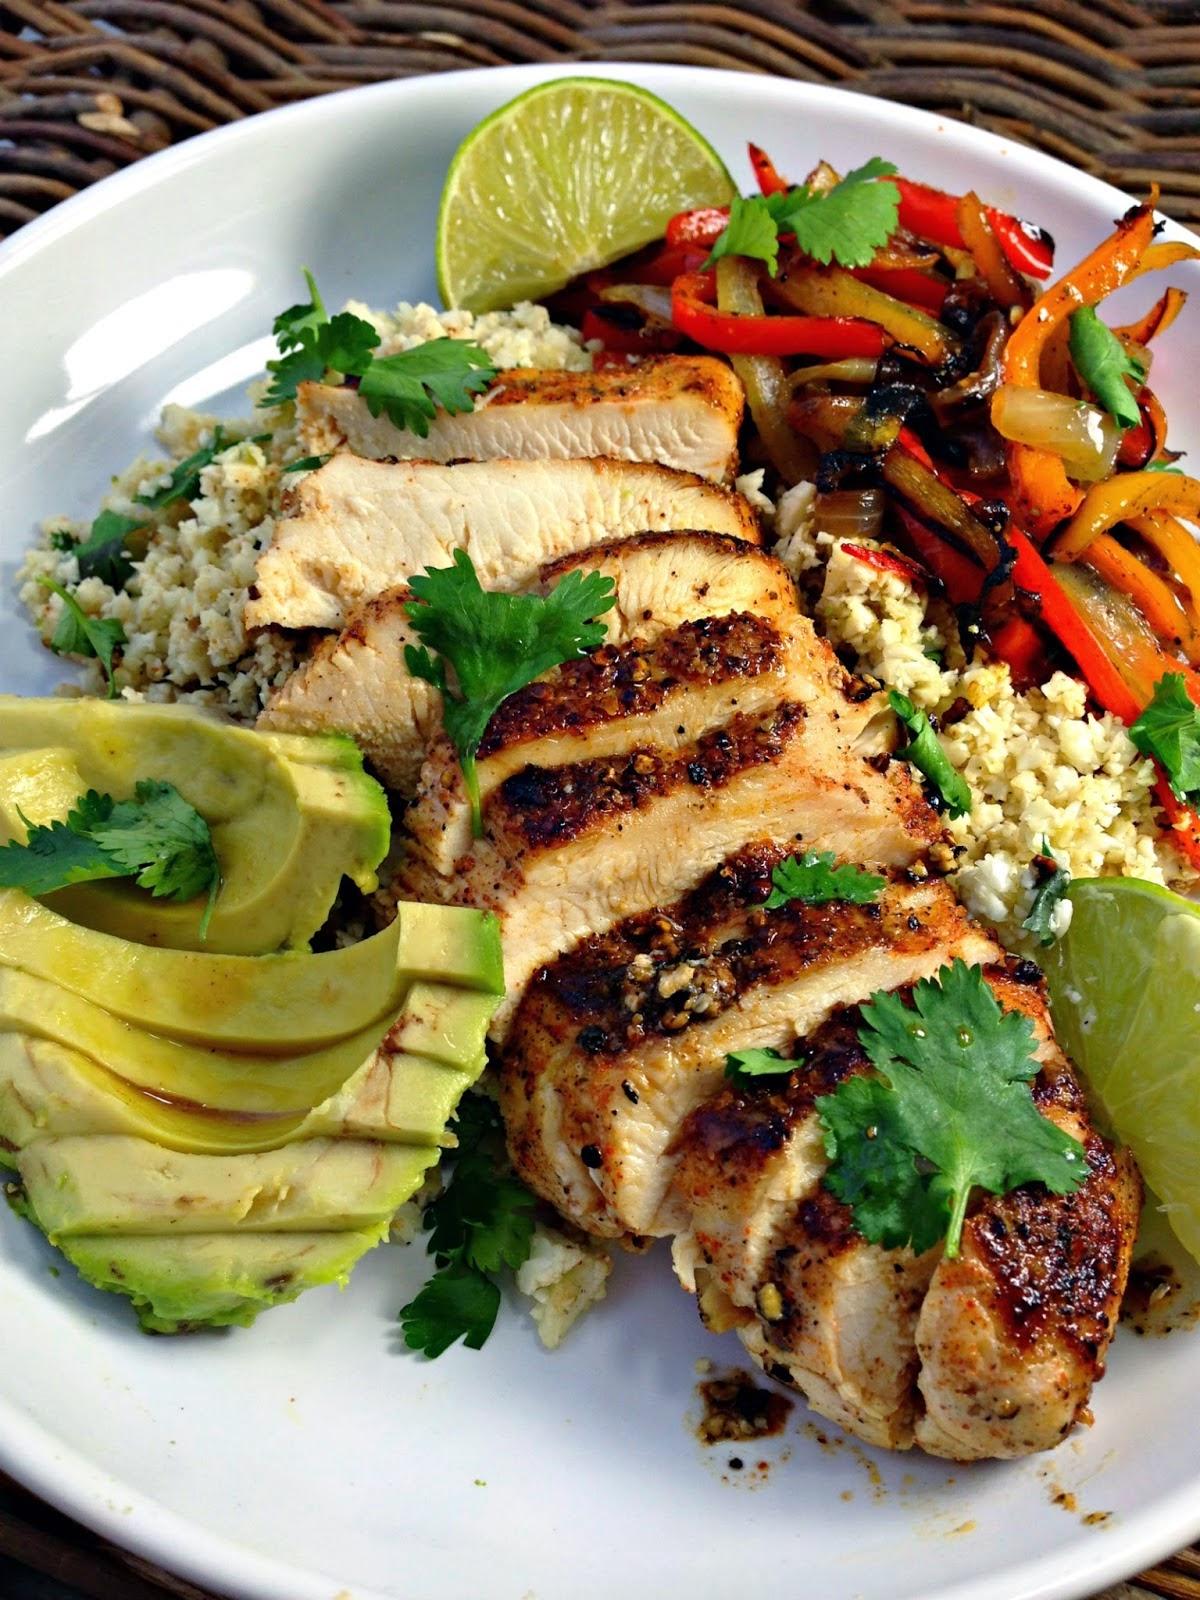 Blackened Chicken Fajitas & Cilantro Lime Cauliflower Rice, shared by From Everyday to Gourmet